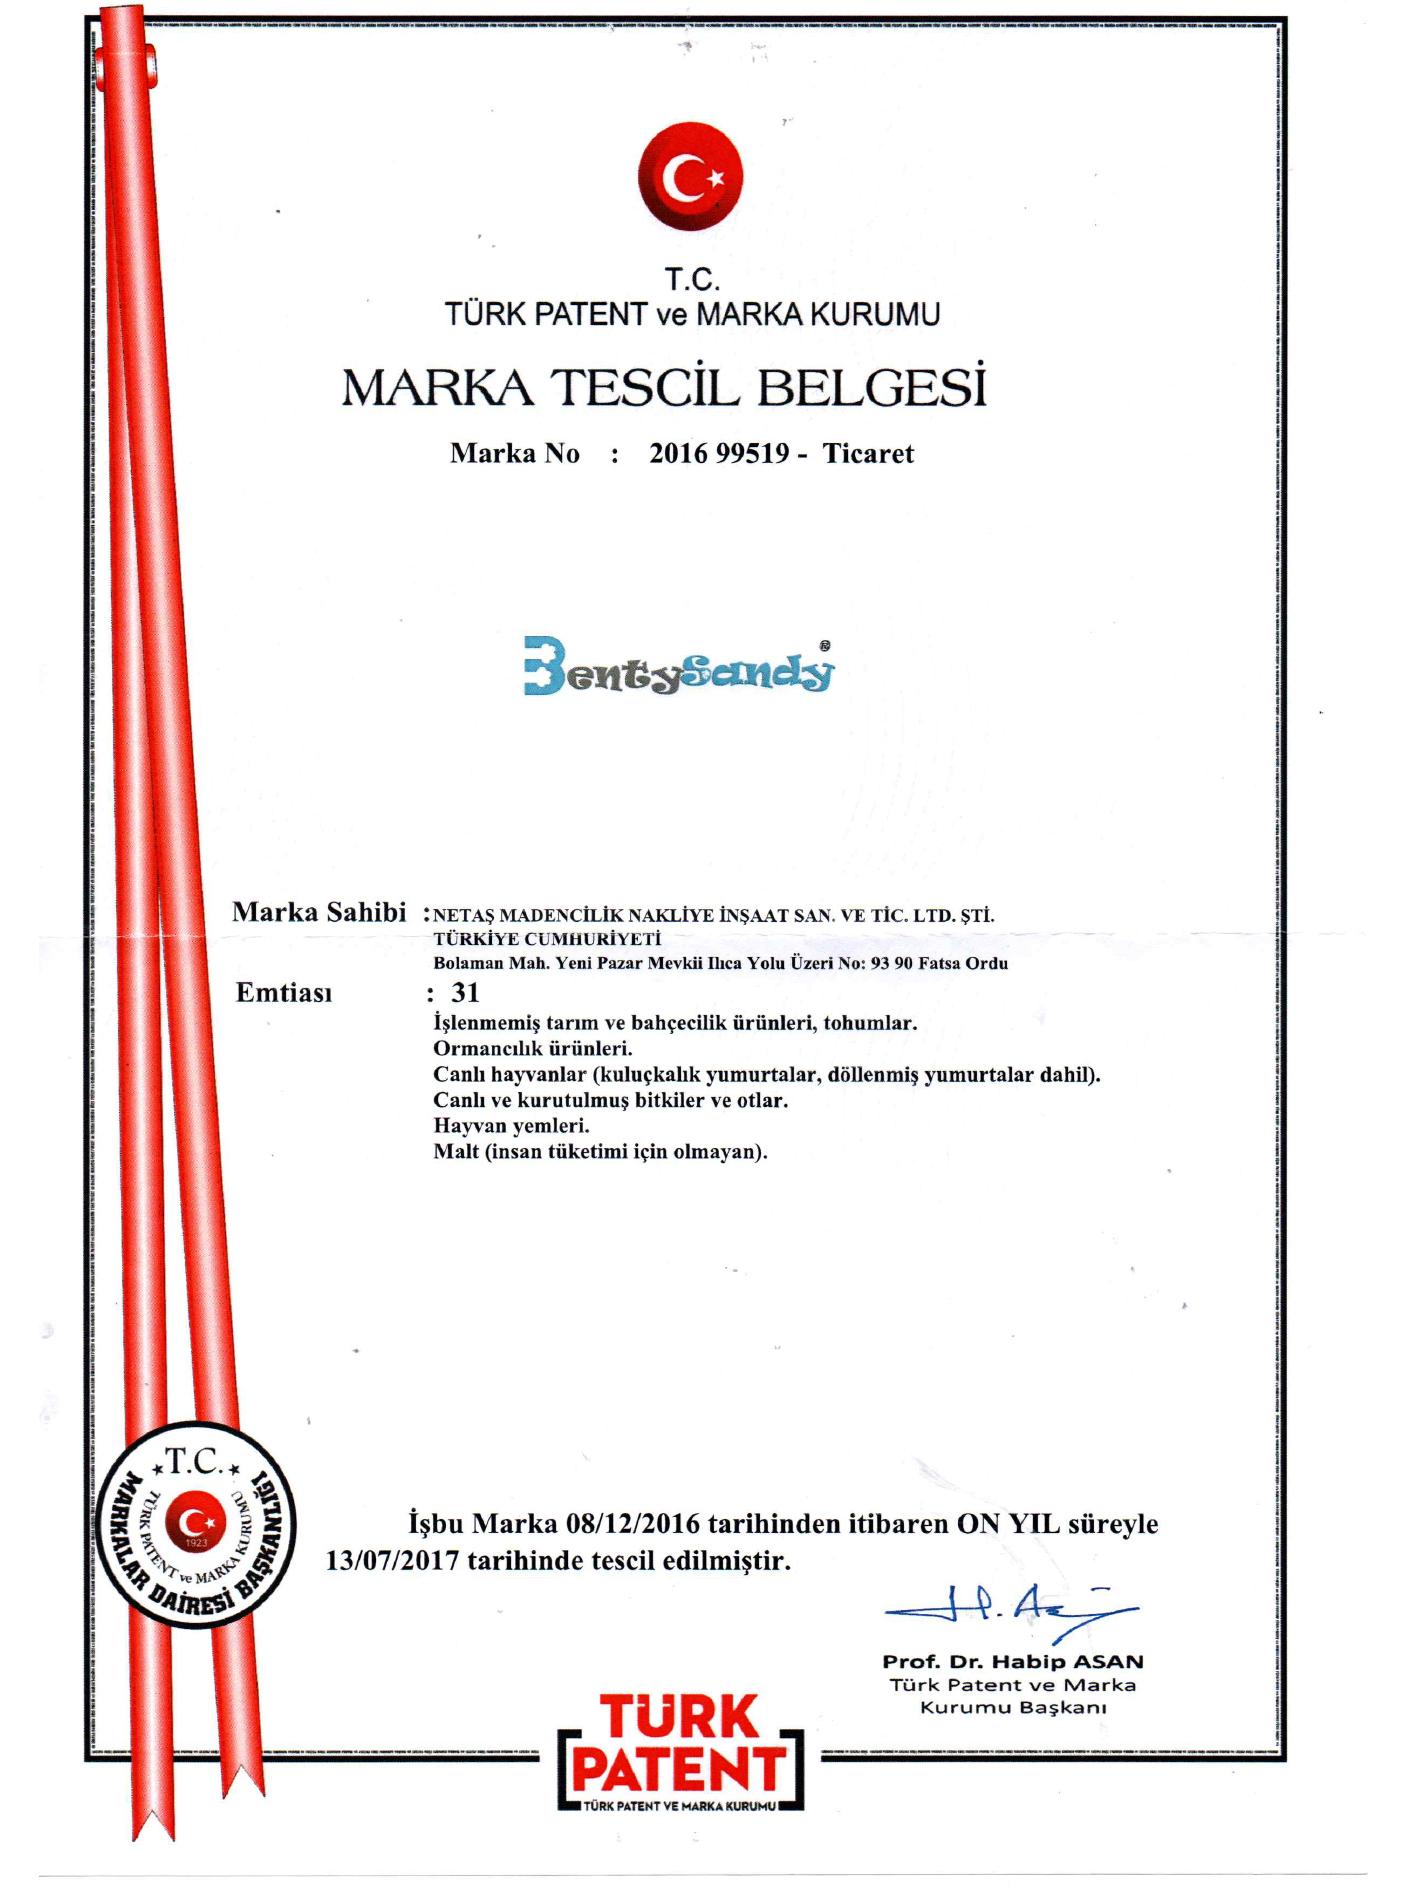 bentysandy patent